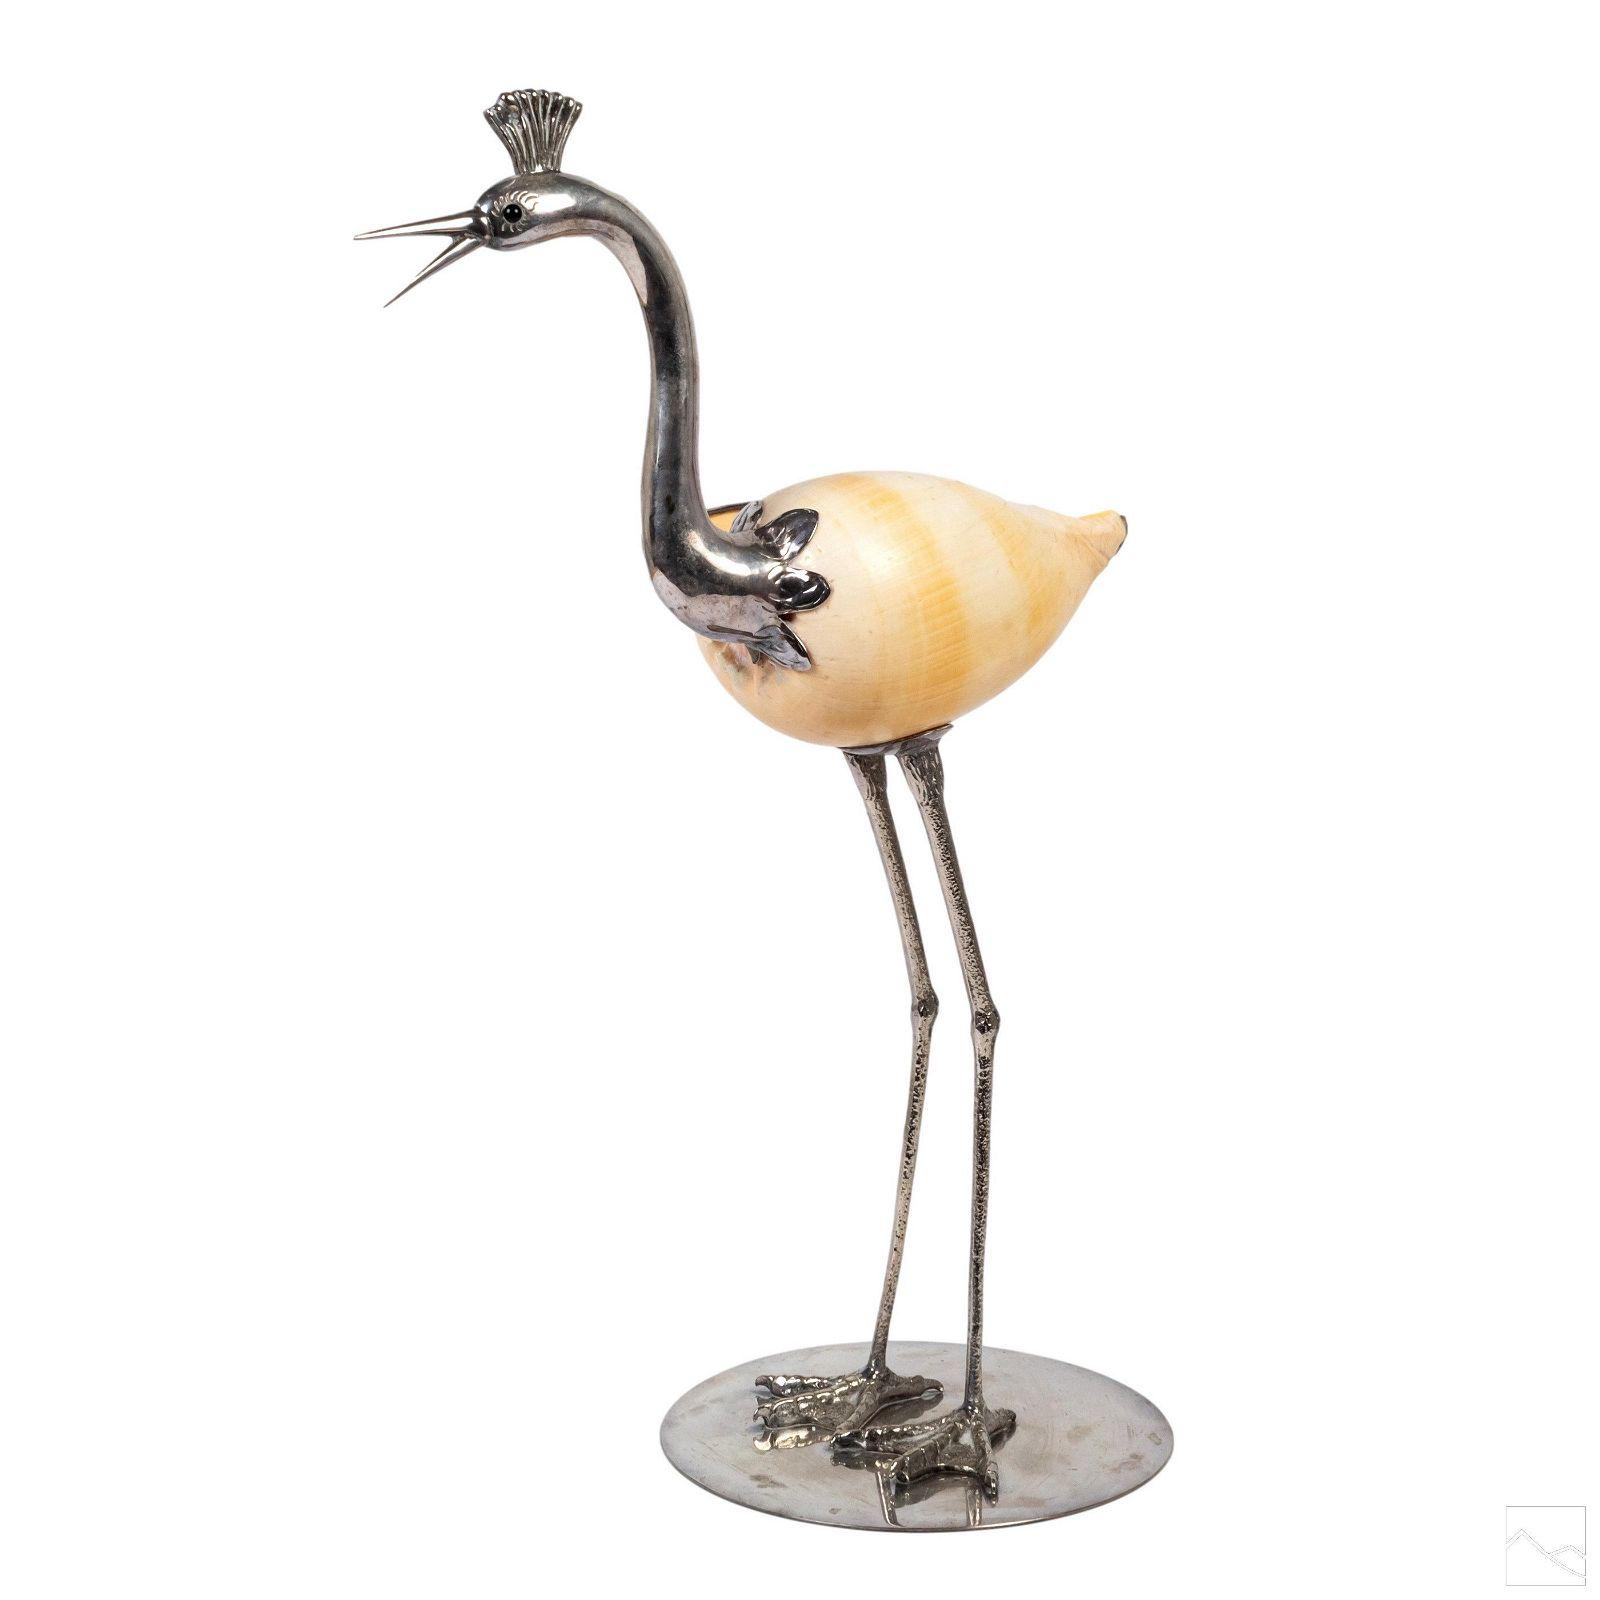 Binazzi Italian Modern Metal Stork Bird Sculpture